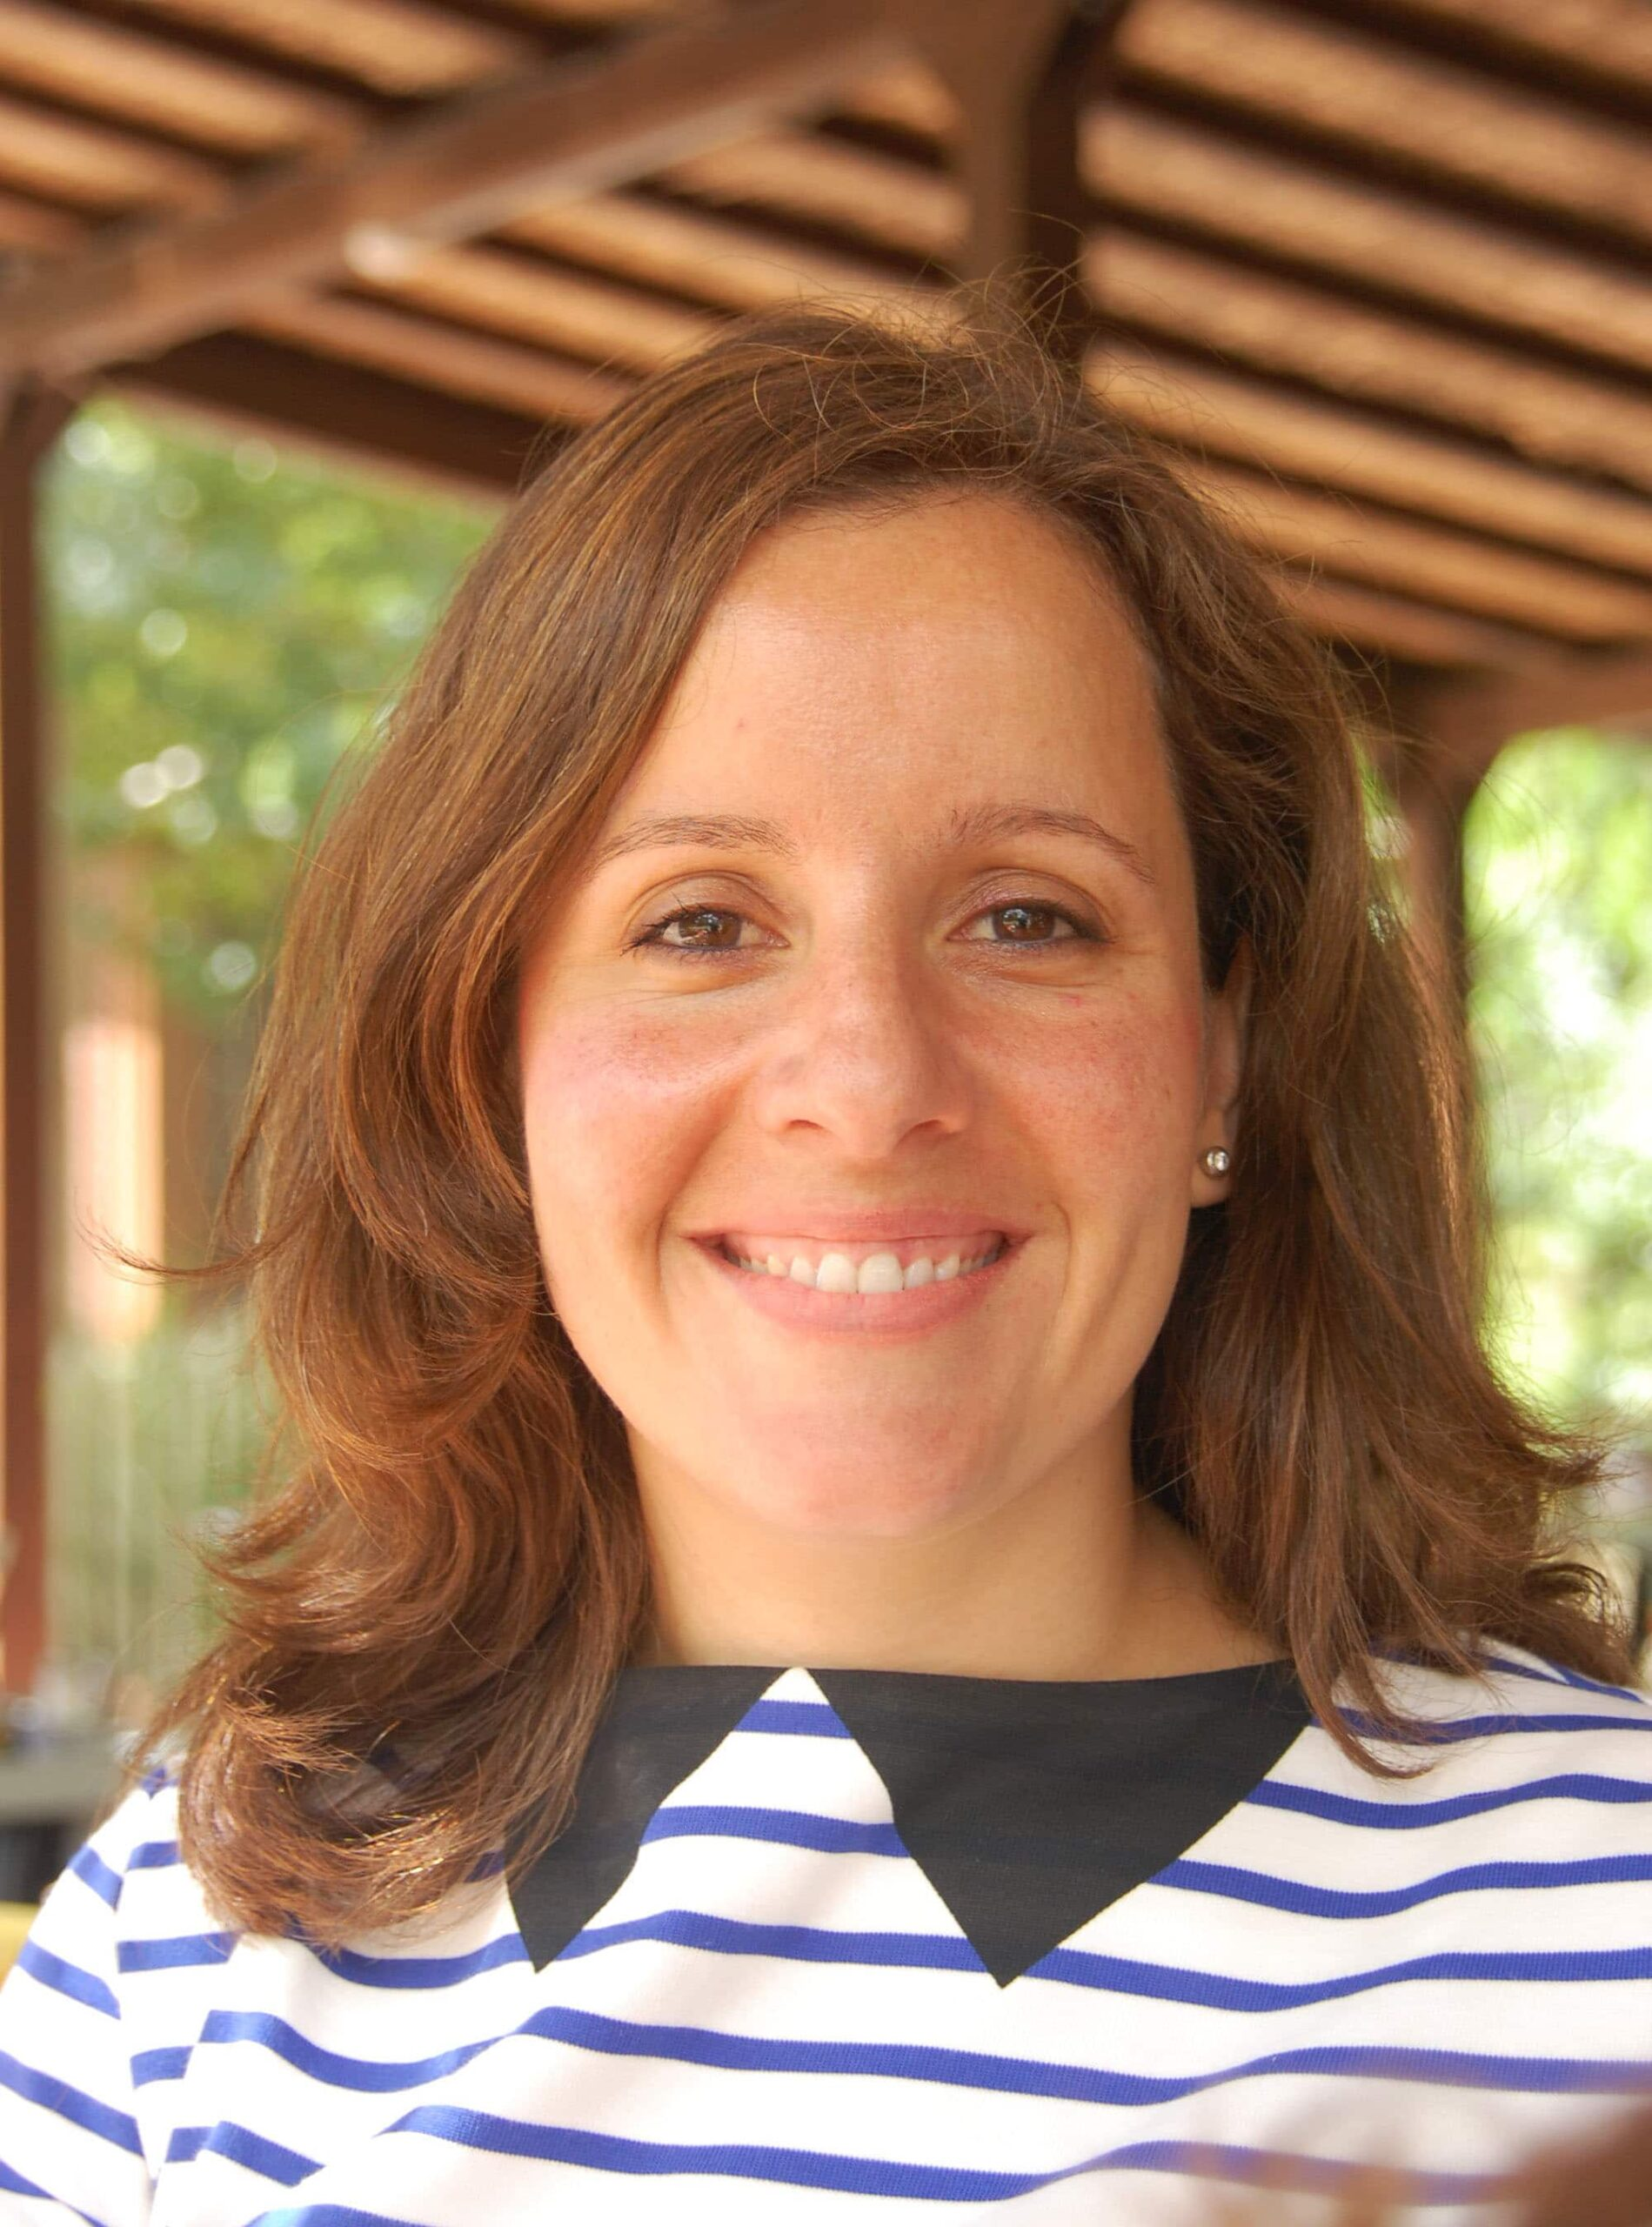 Patricia Tabernero Estévez